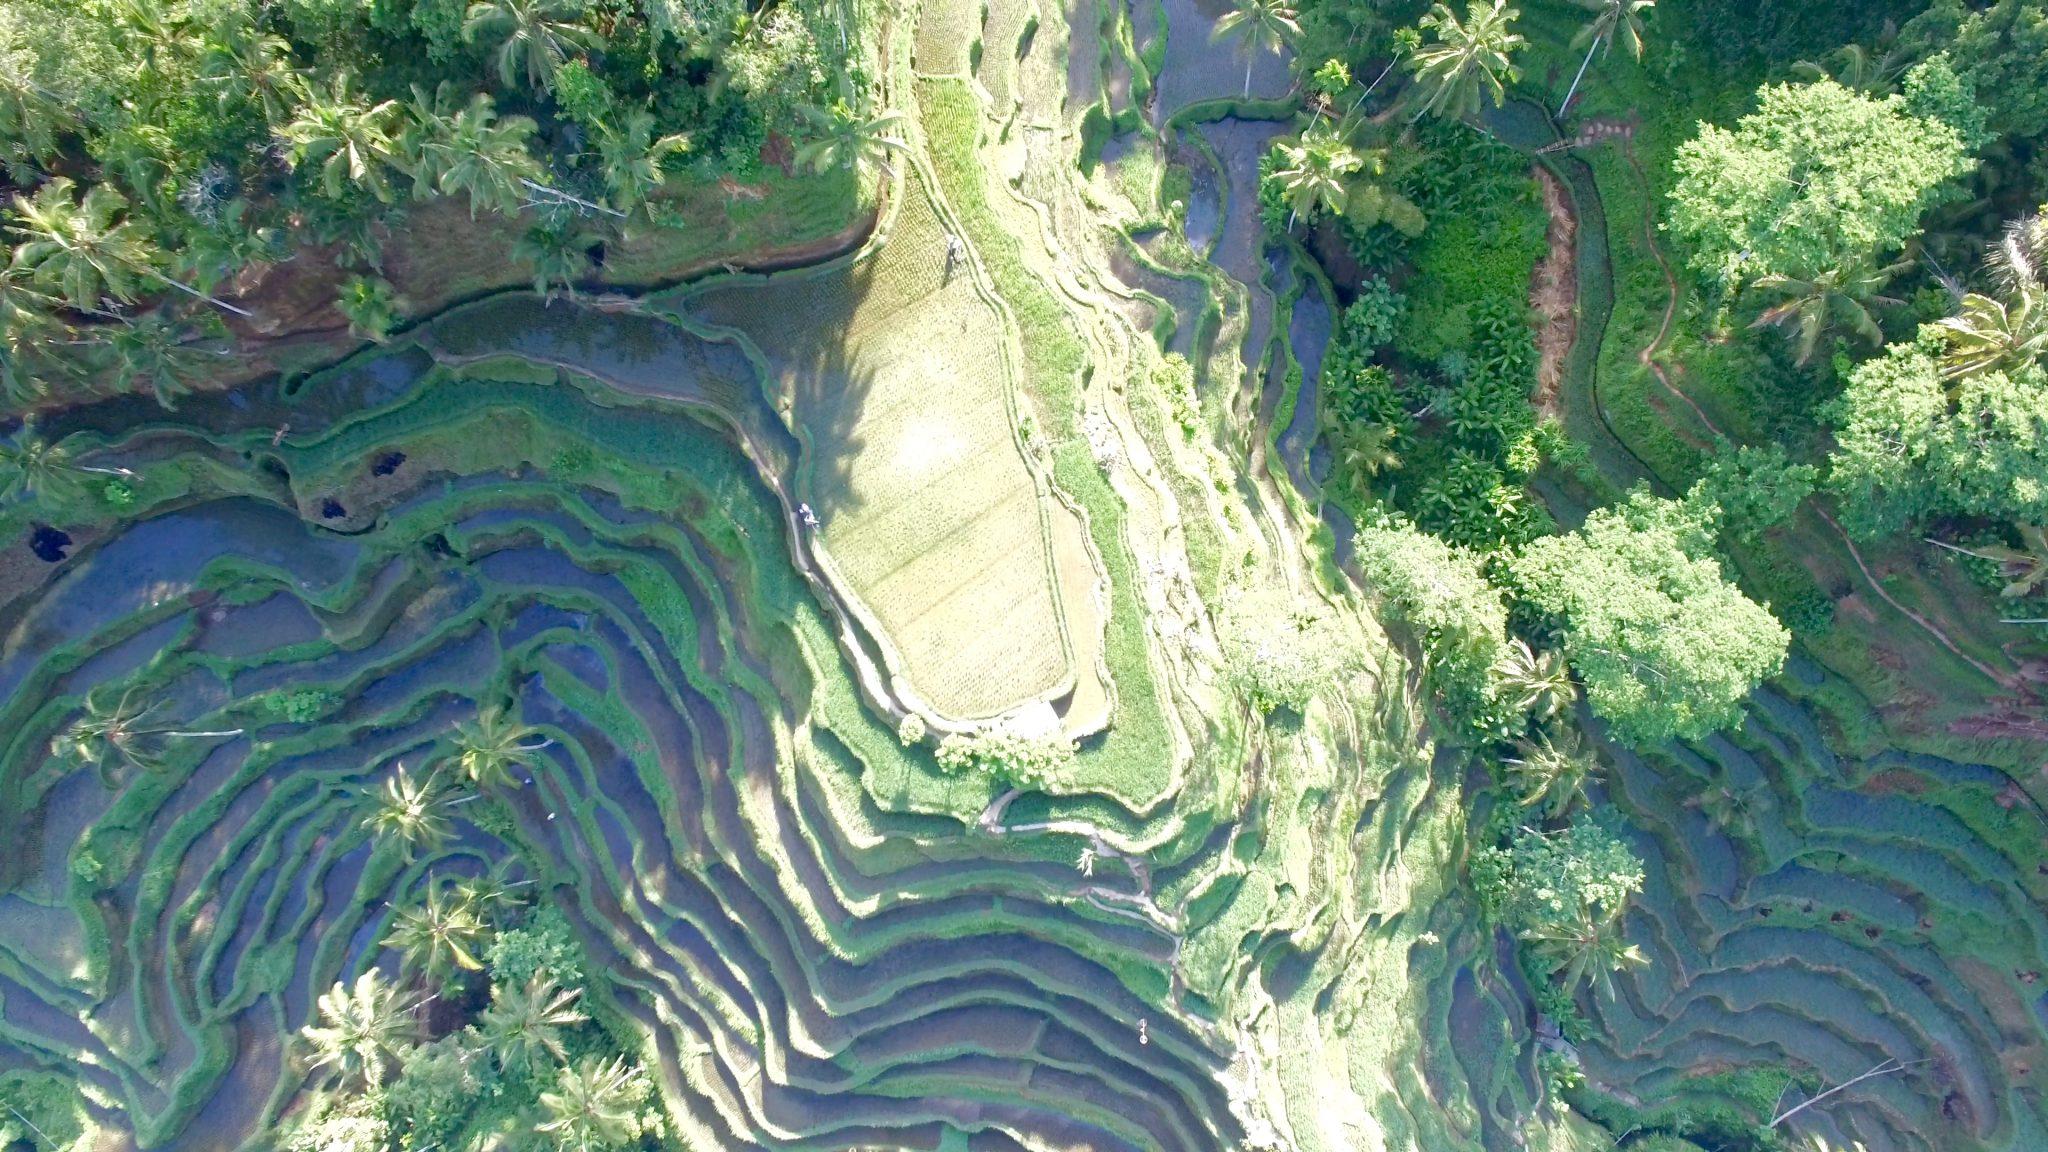 tegalalang, rice terrace, bali, ubud, drone shot, aerial view